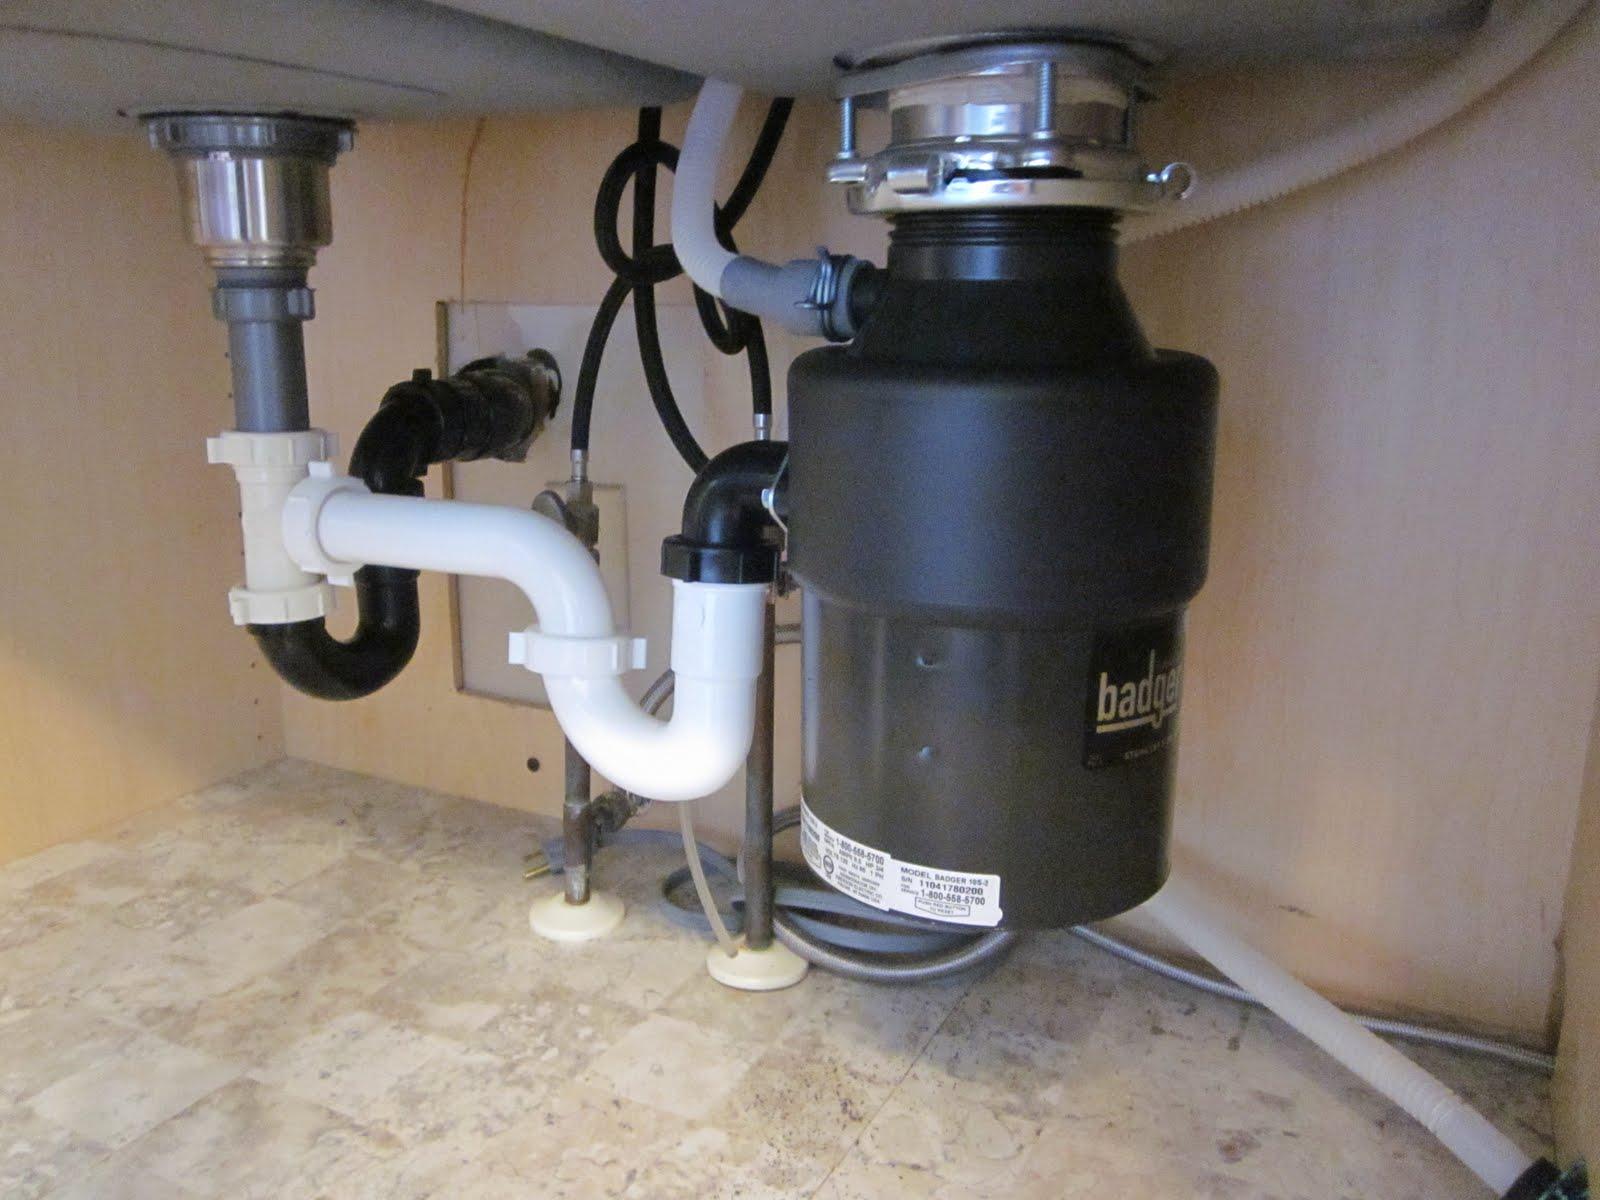 kitchen sink plumbing with garbage disposal and dishwasher unclog kitchen sink Similiar Connecting Garbage Disposal To Sink Keywords Kitchen Sink Drain Clogged